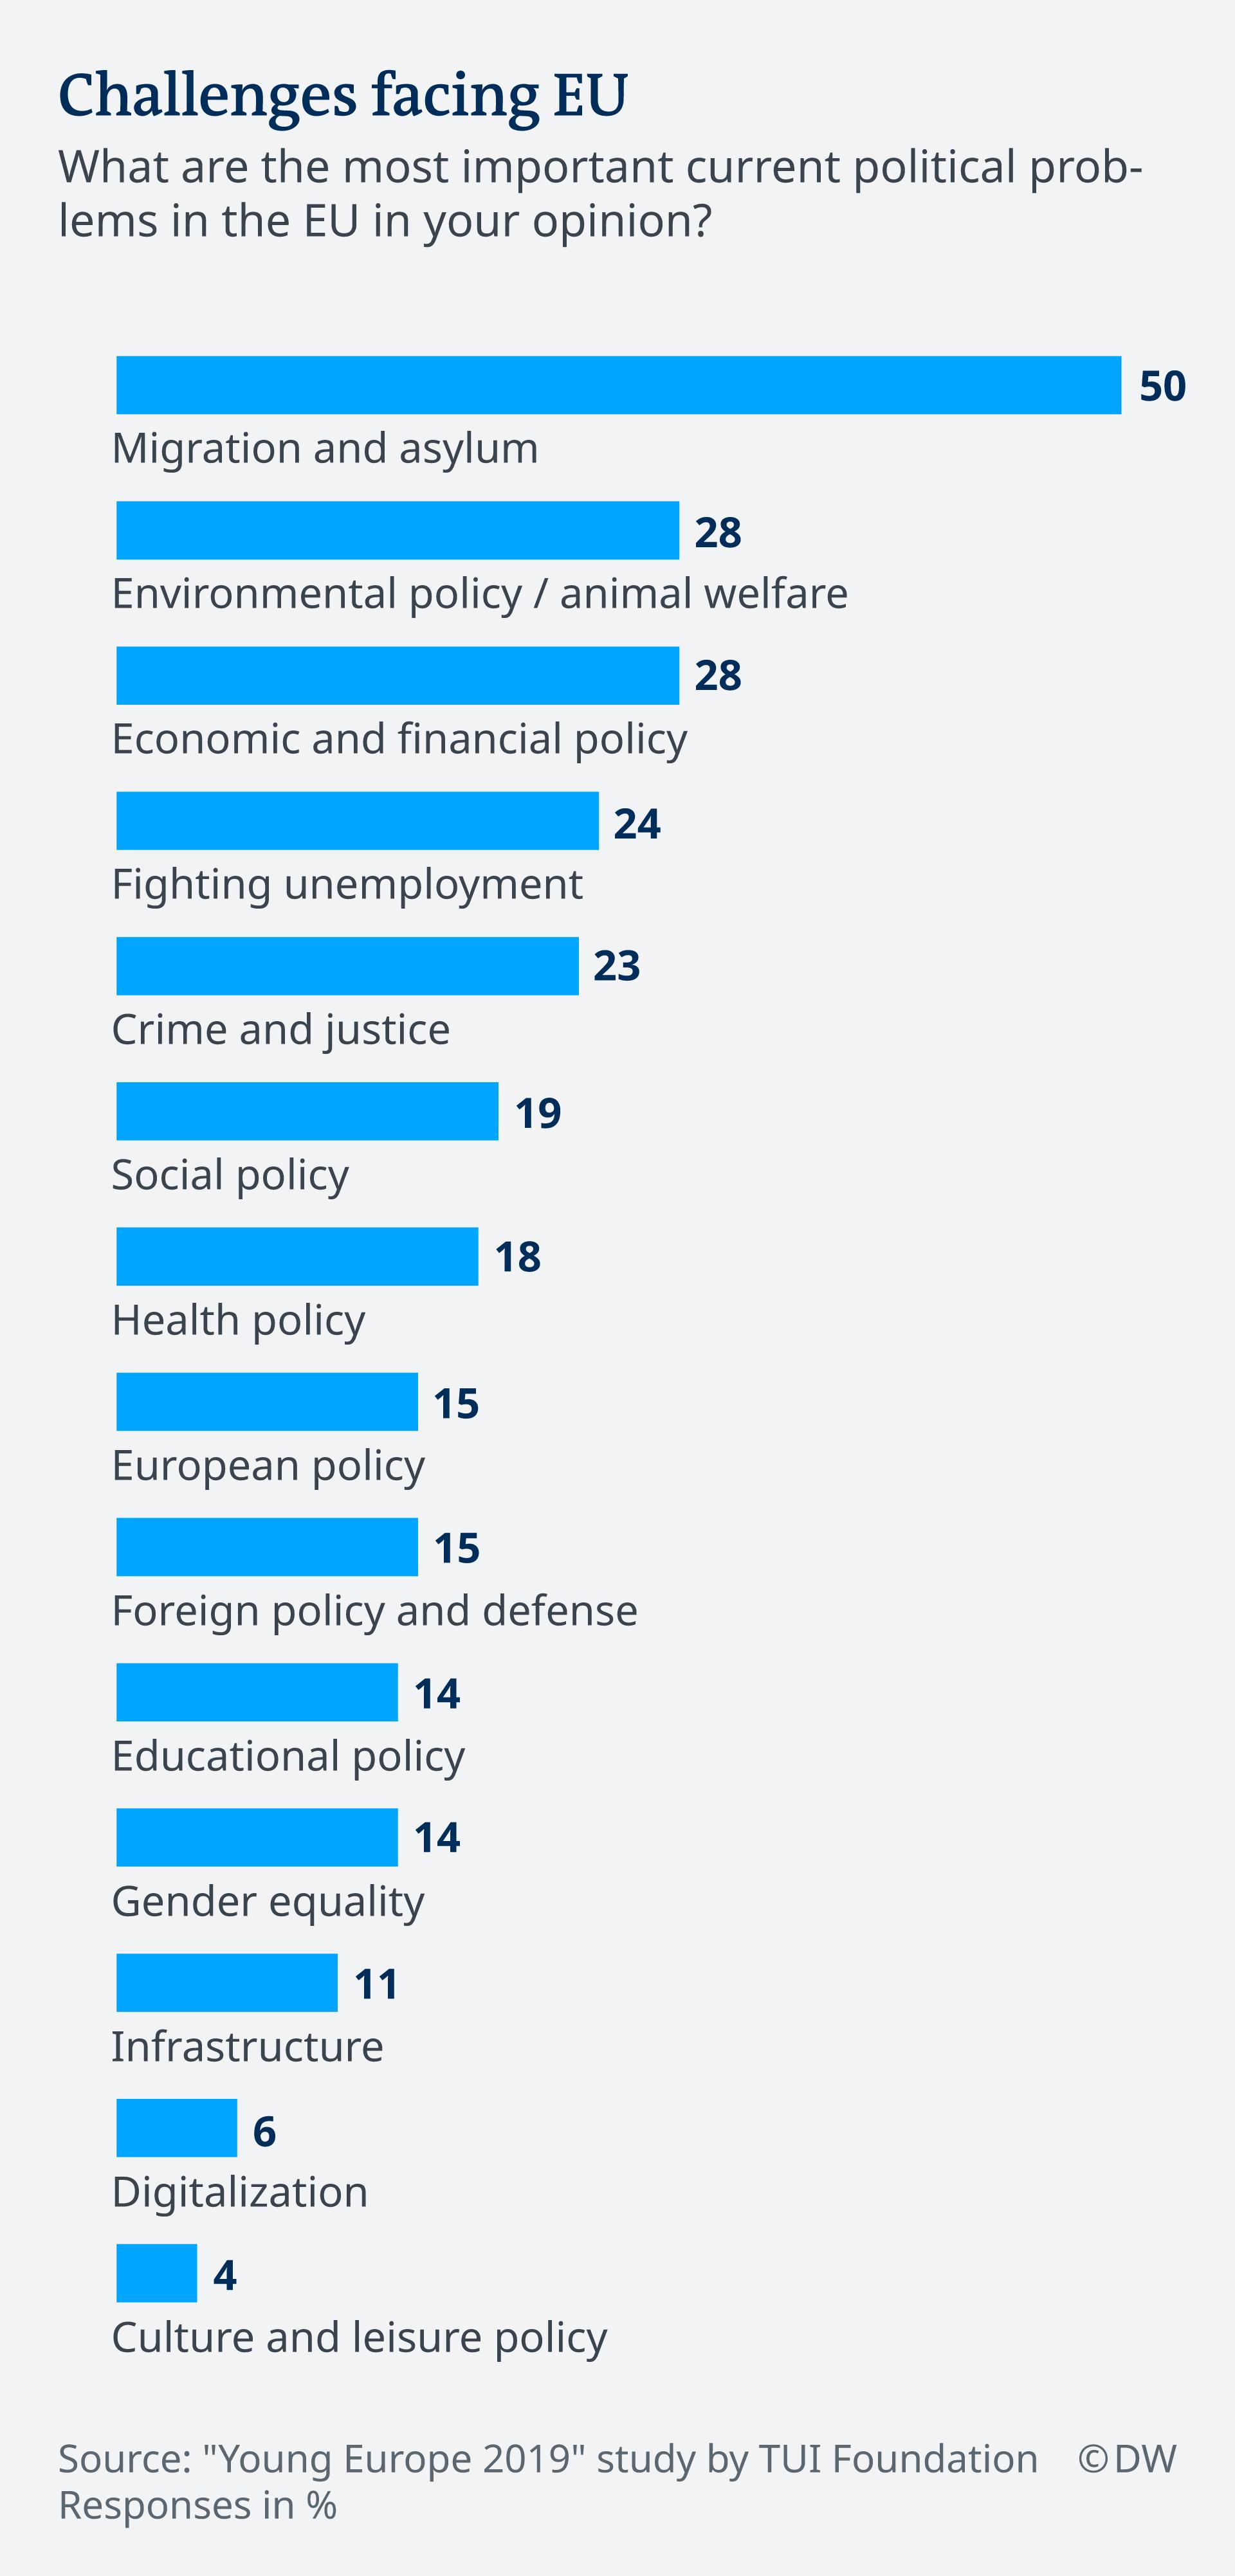 DW Infographic: Challenges facing EU